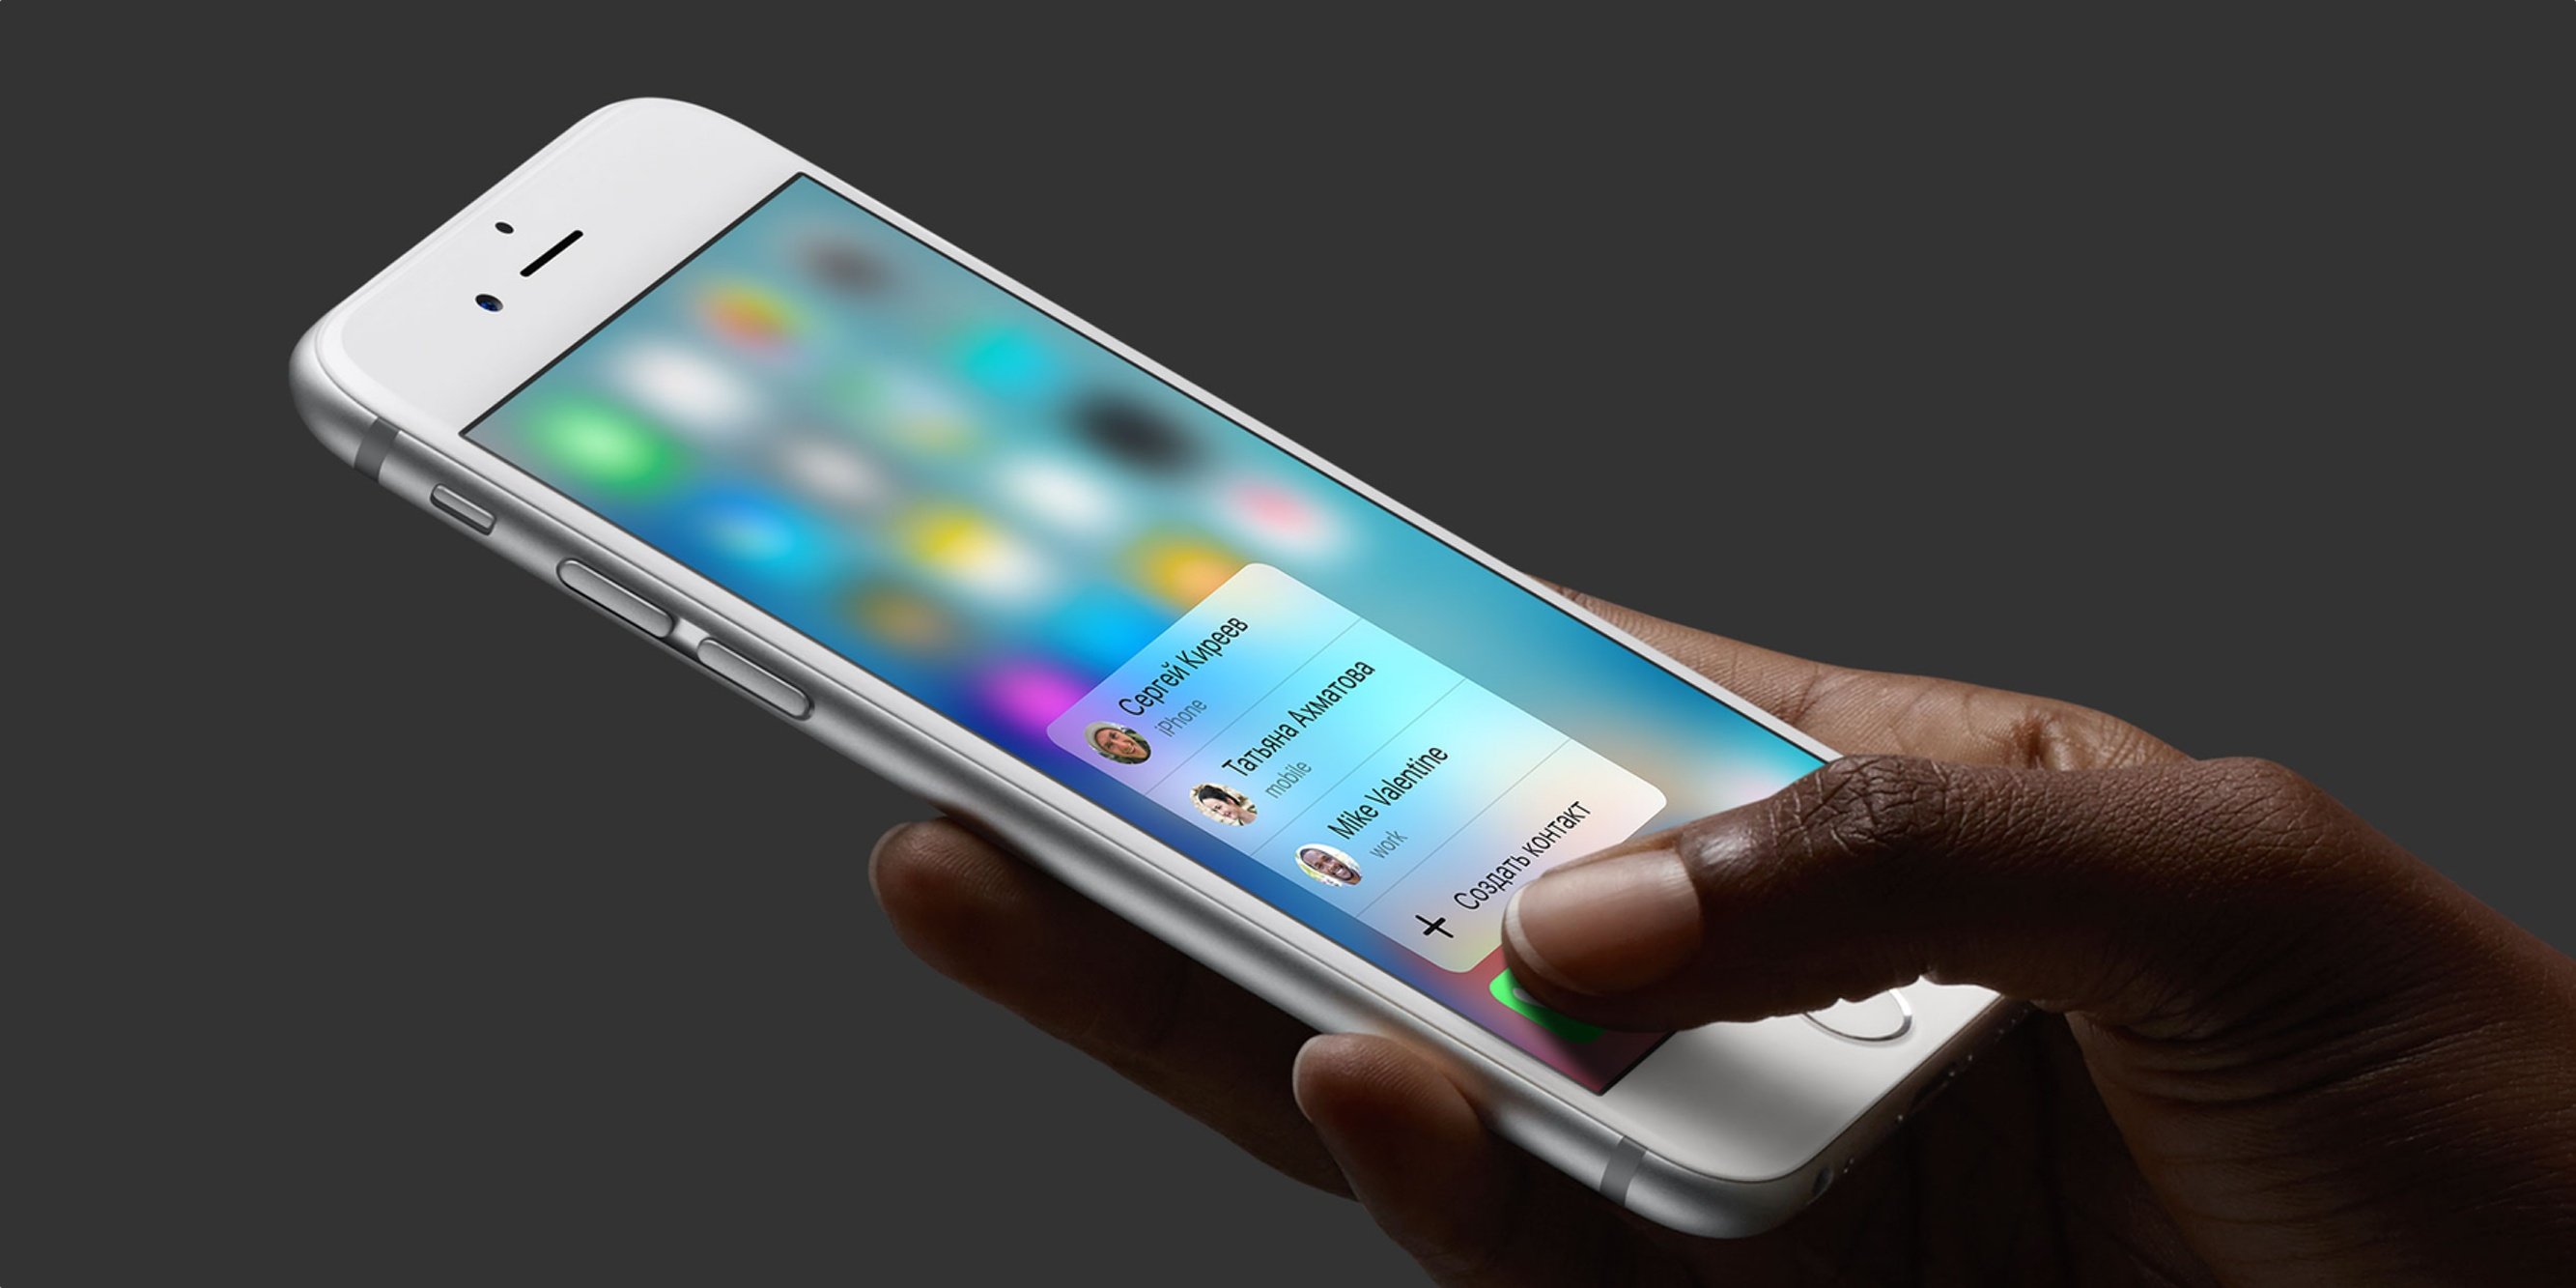 3D Touch — все об эксклюзивной технологии новых iPhone 6s и 6s Plus